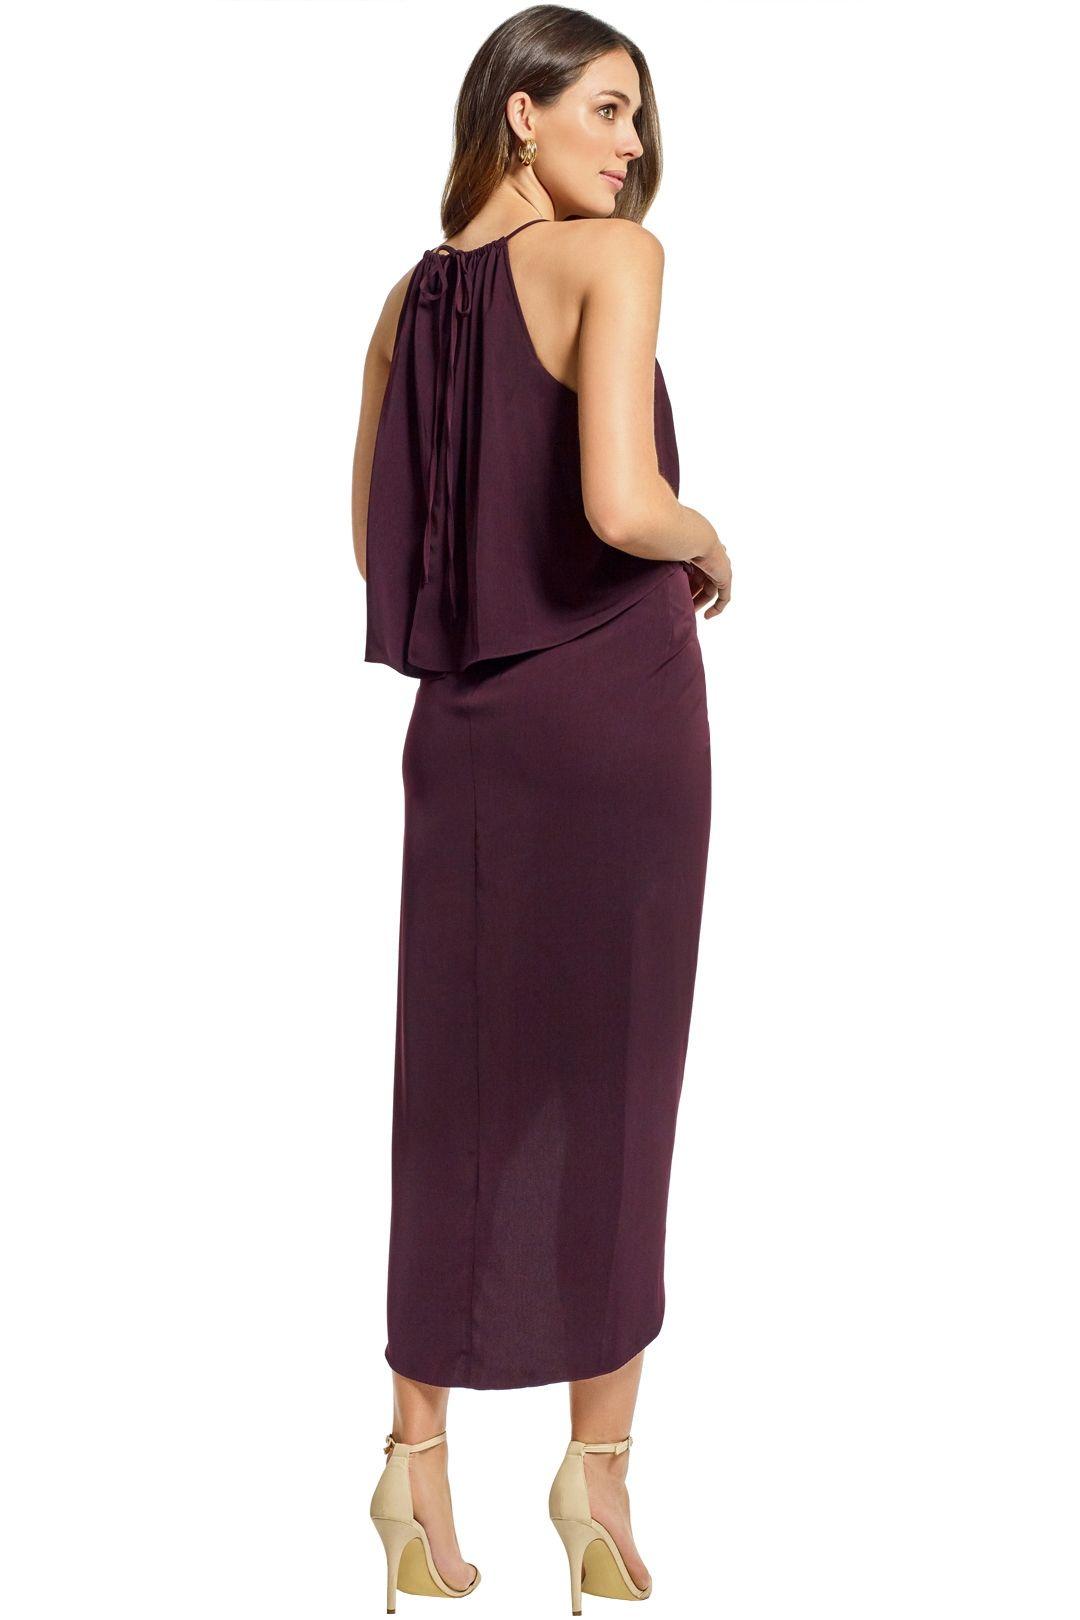 Shona Joy - Frill High Neck Drape Maxi Dress - Aubergine - Back